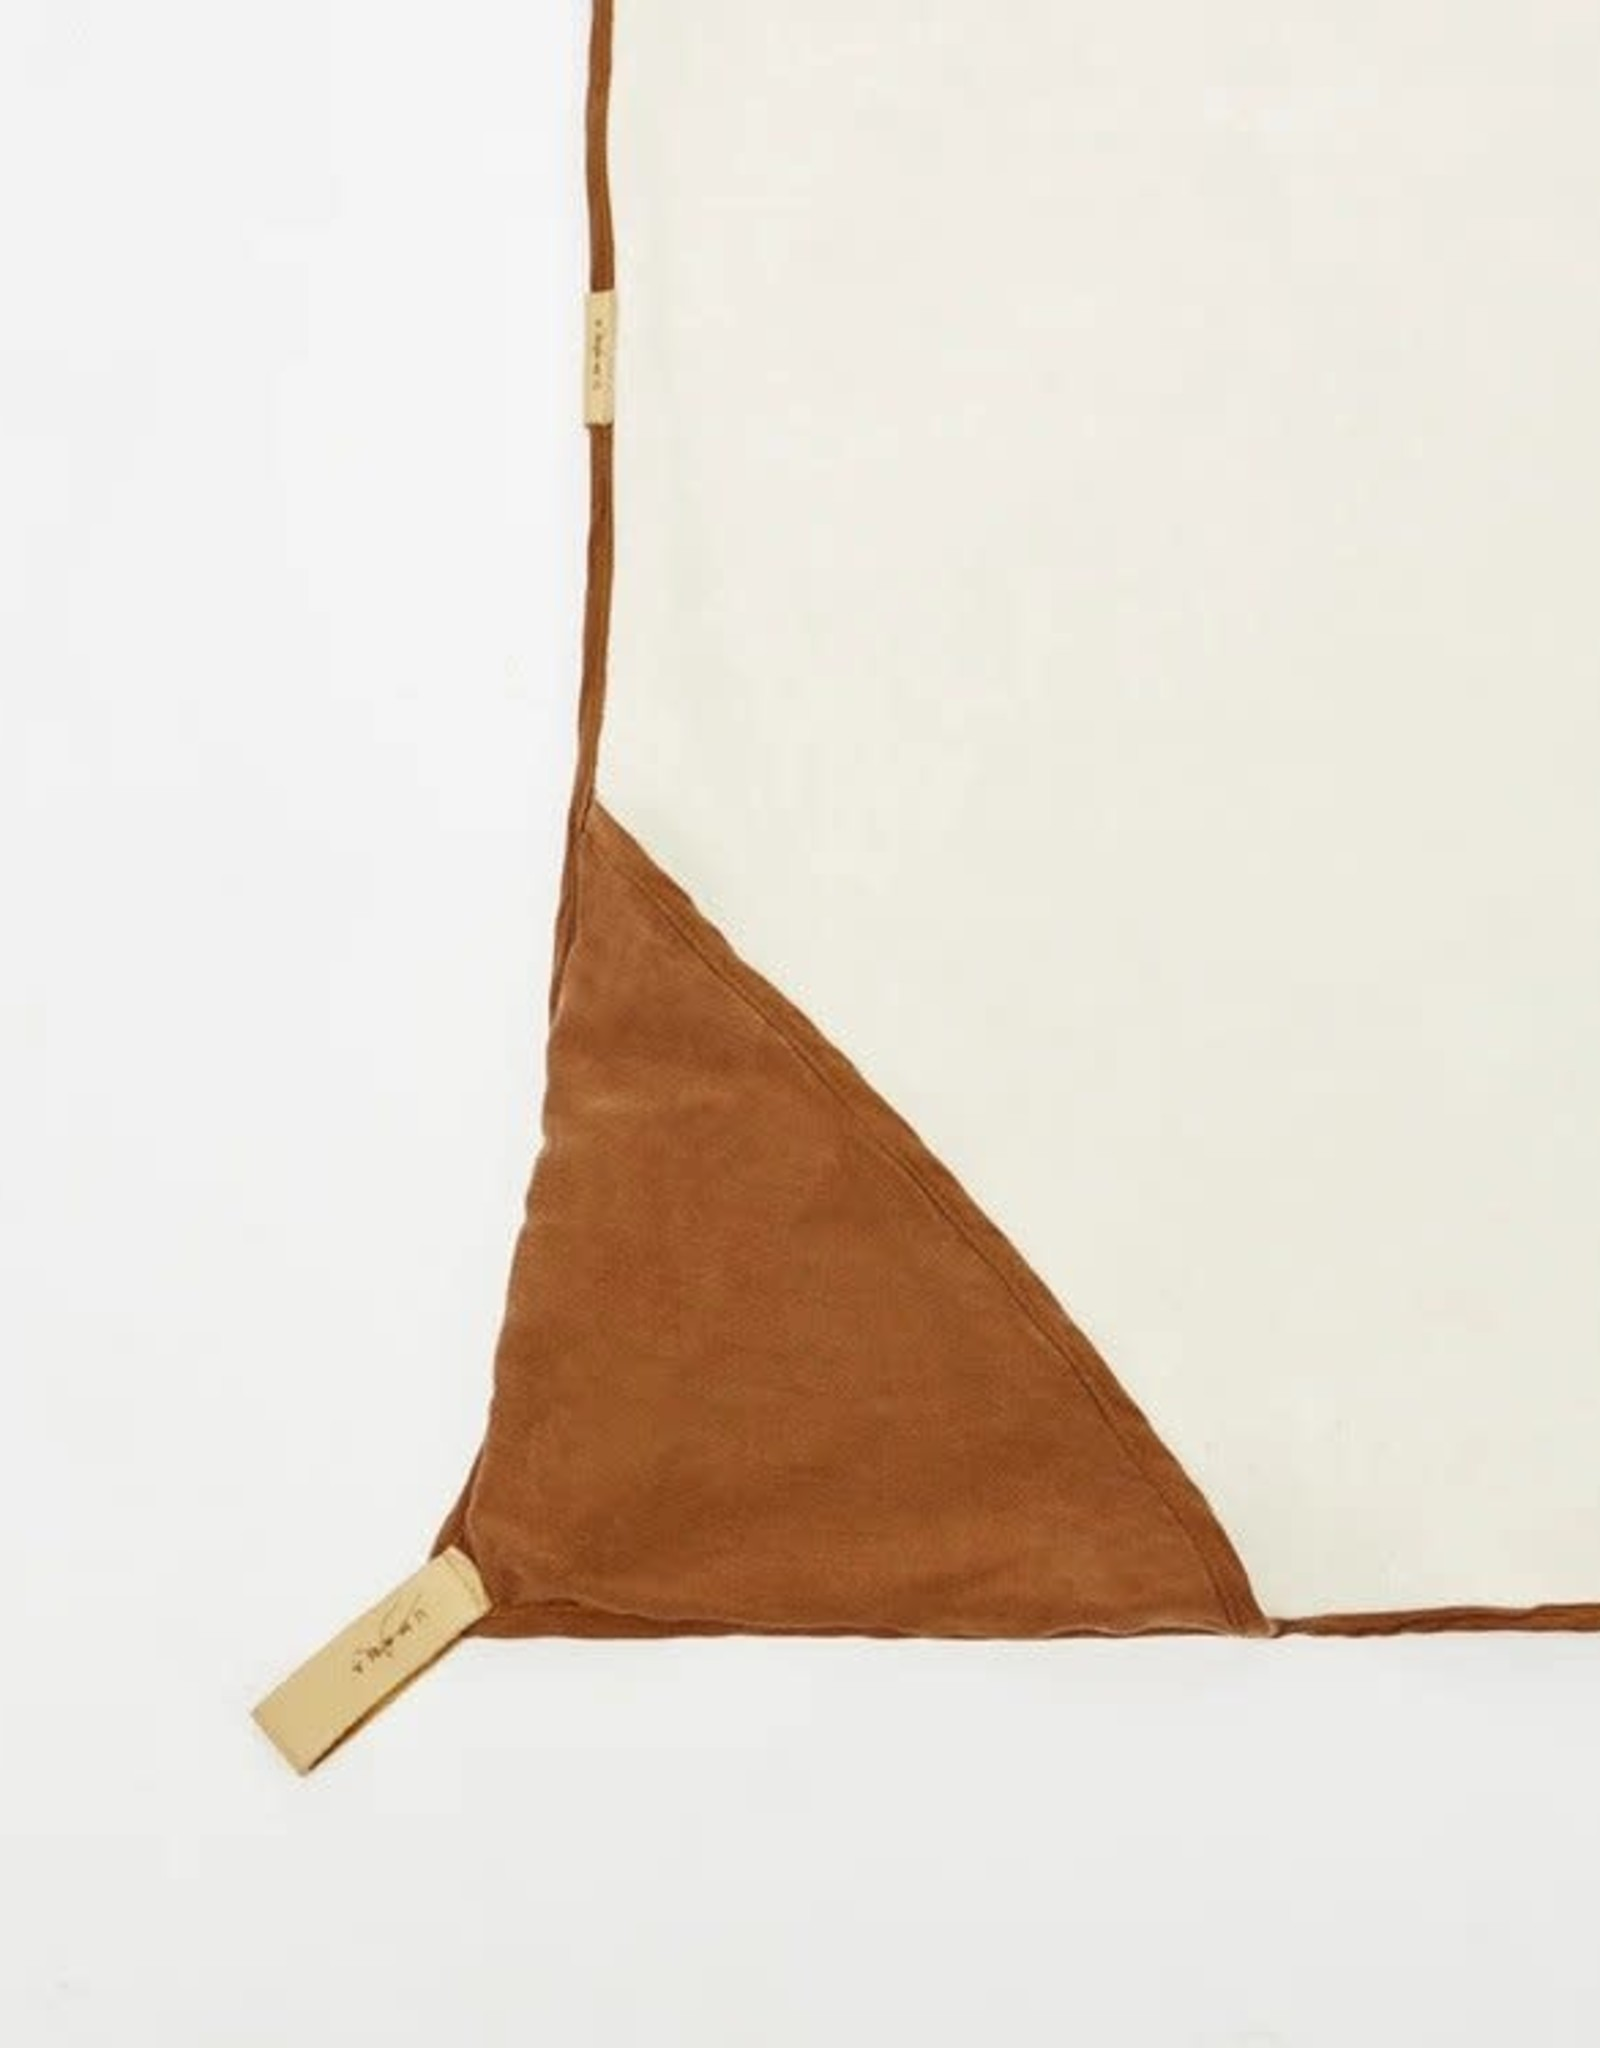 Umana Hooded Towel - Choose your color